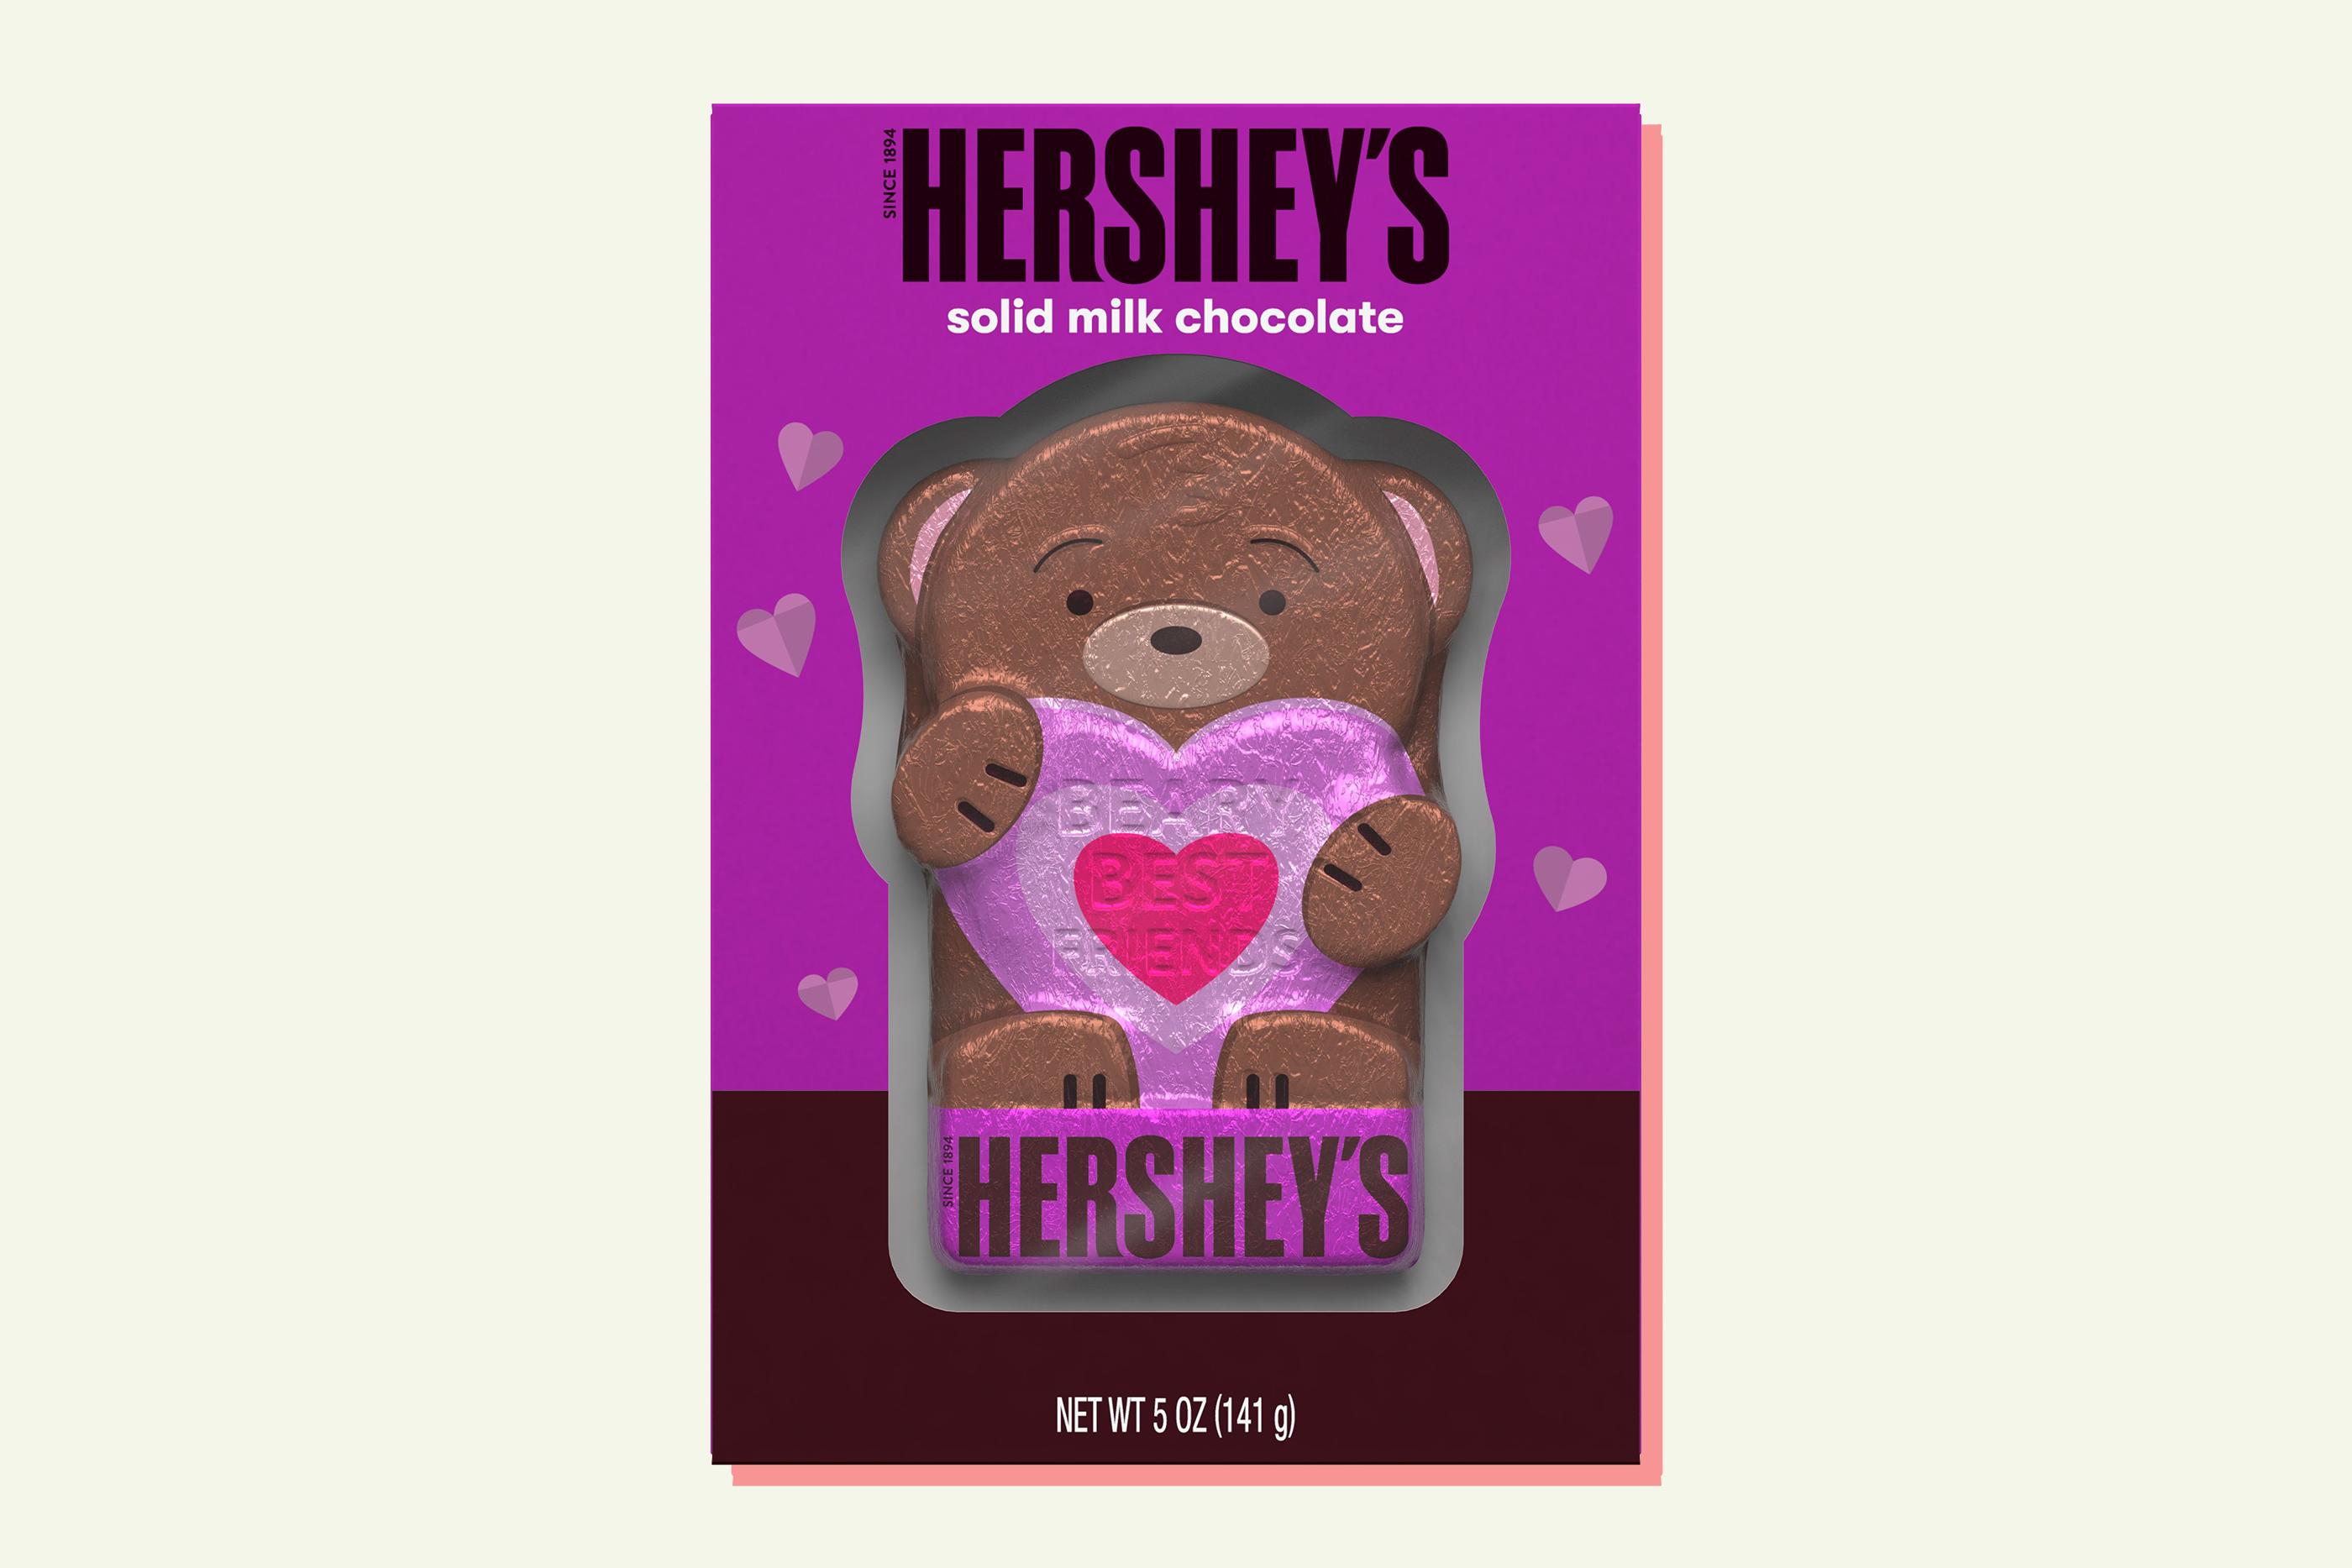 OSO DE CHOCOLATE CON LECHE DE HERSHEY